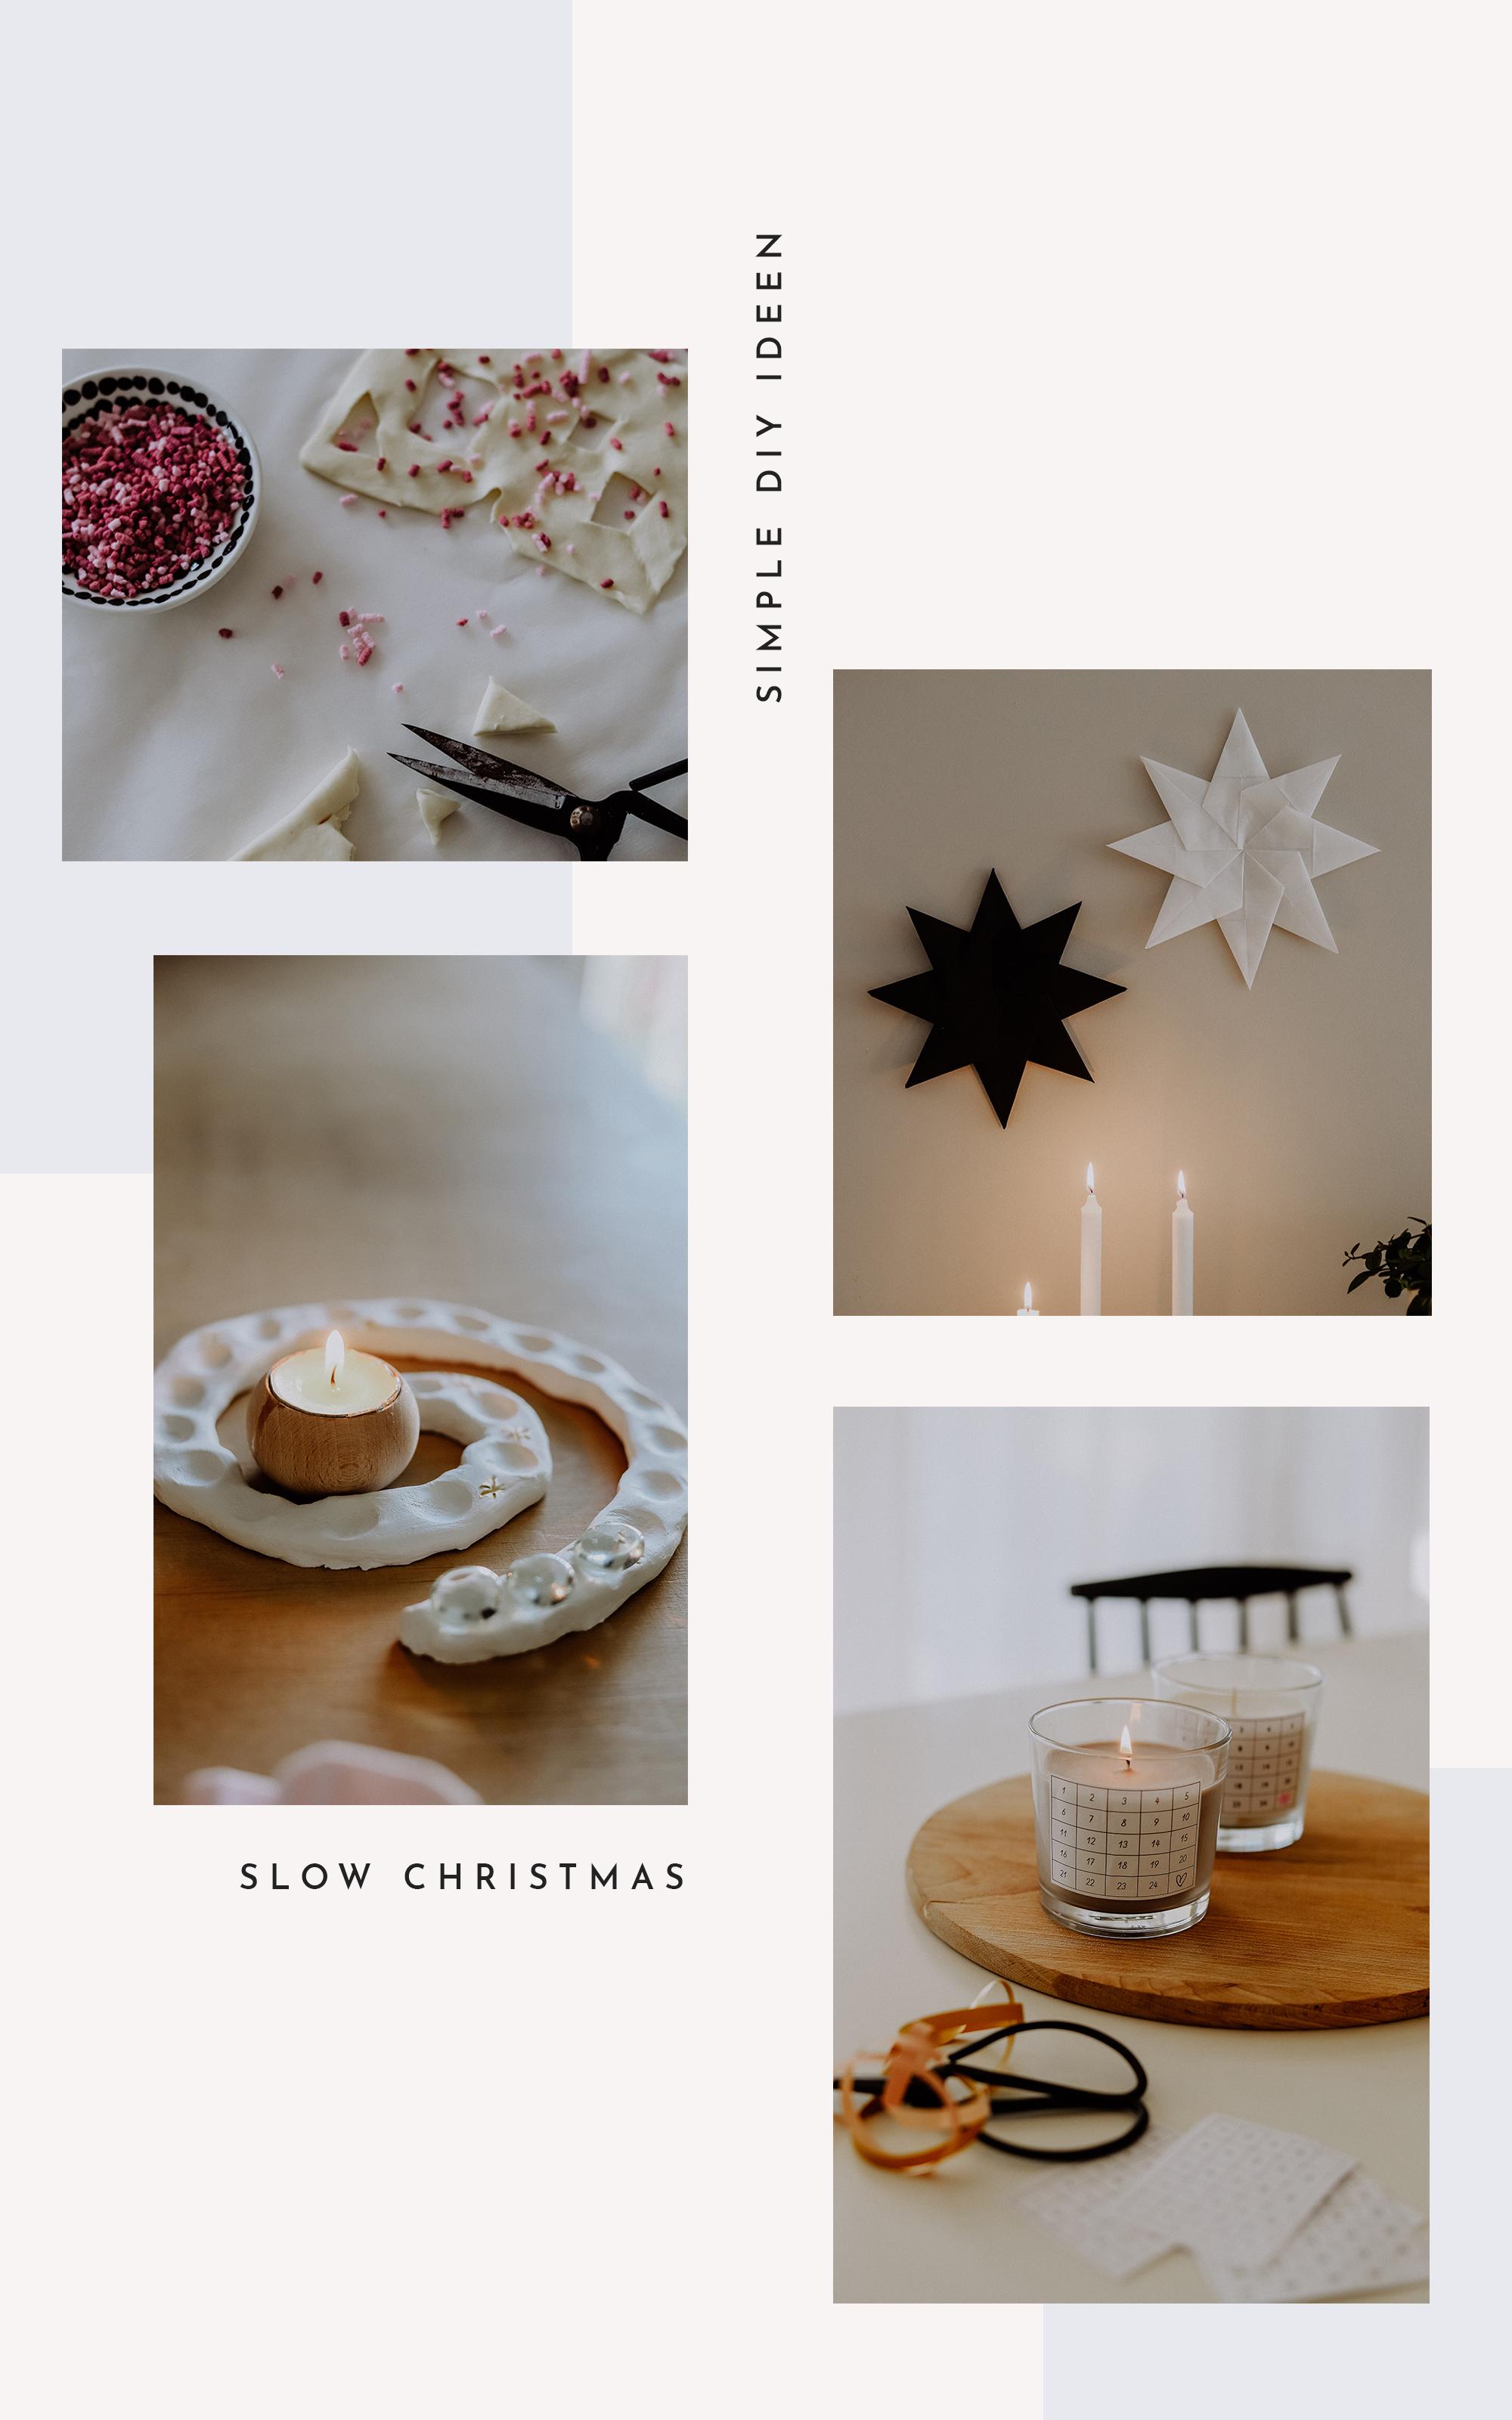 Slow Christmas: Einfache DIY Ideen